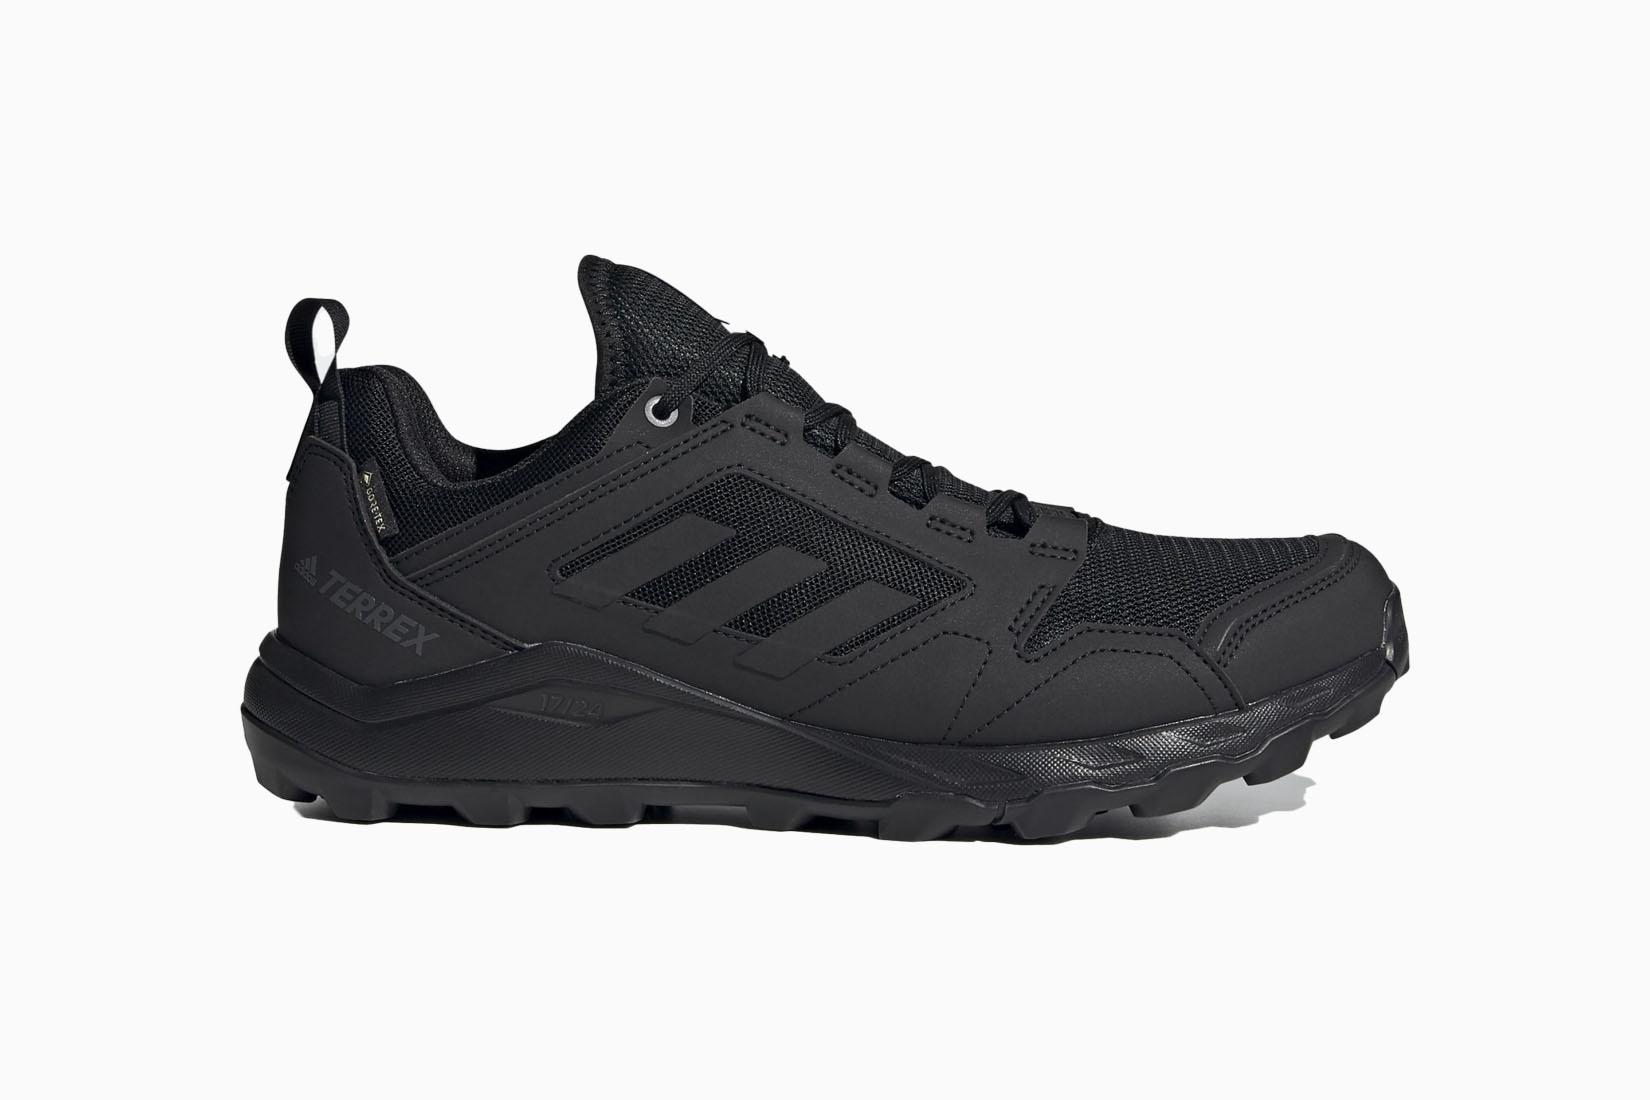 best waterproof shoes men adidas review Luxe Digital